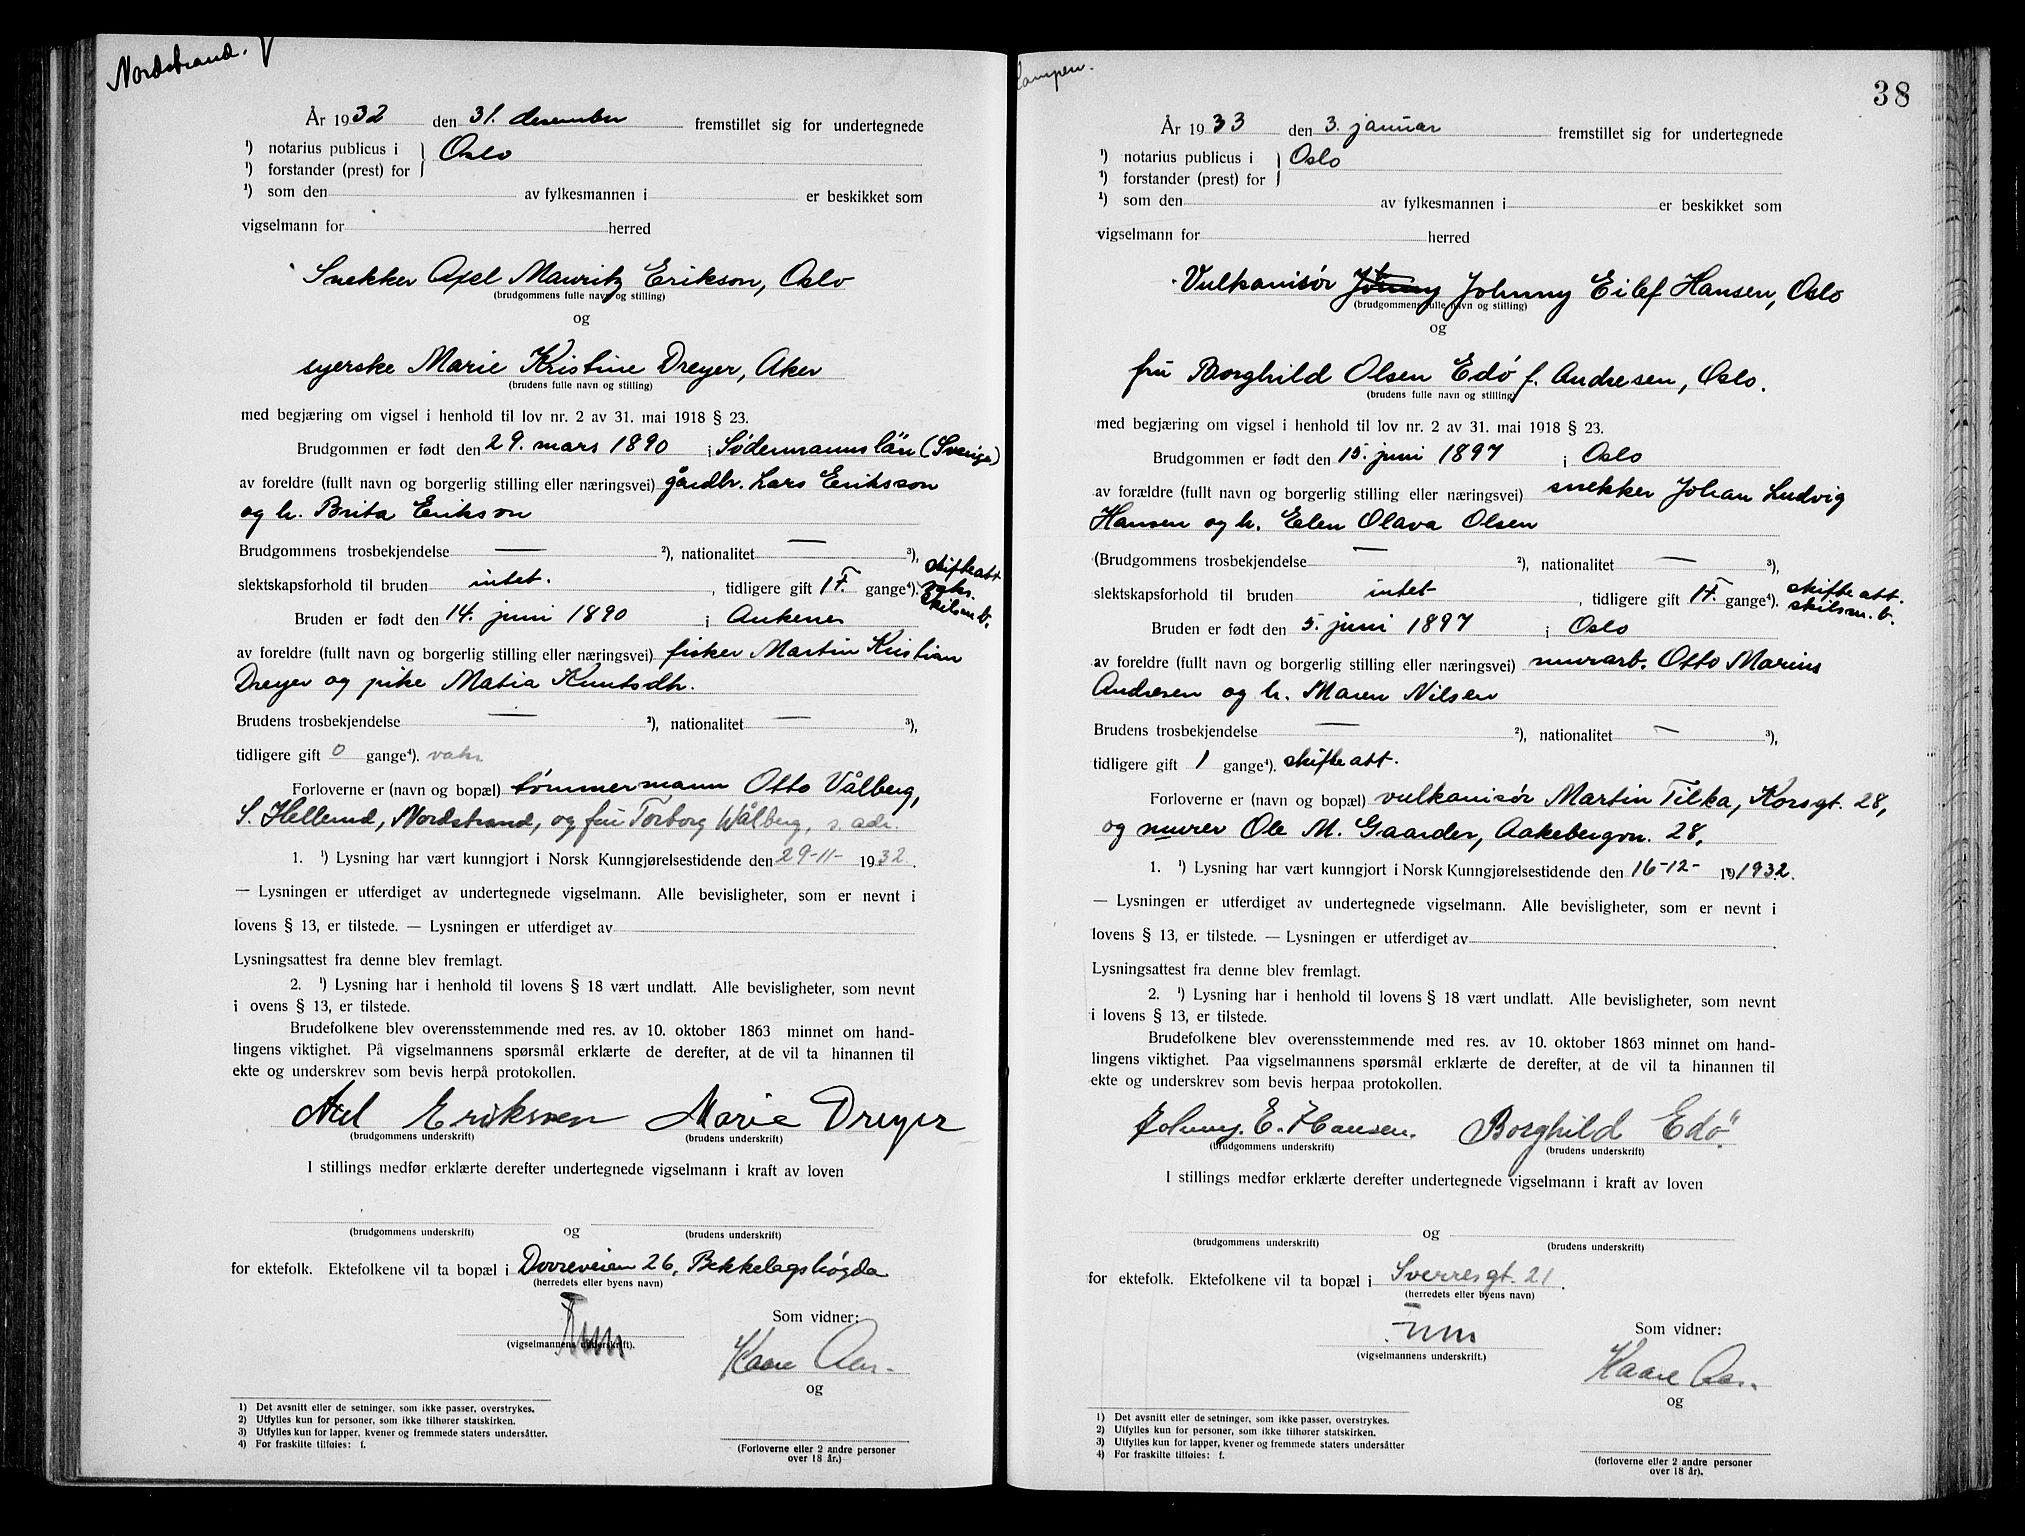 SAO, Oslo byfogd avd. I, L/Lb/Lbb/L0022: Notarialprotokoll, rekke II: Vigsler, 1932-1933, s. 37b-38a